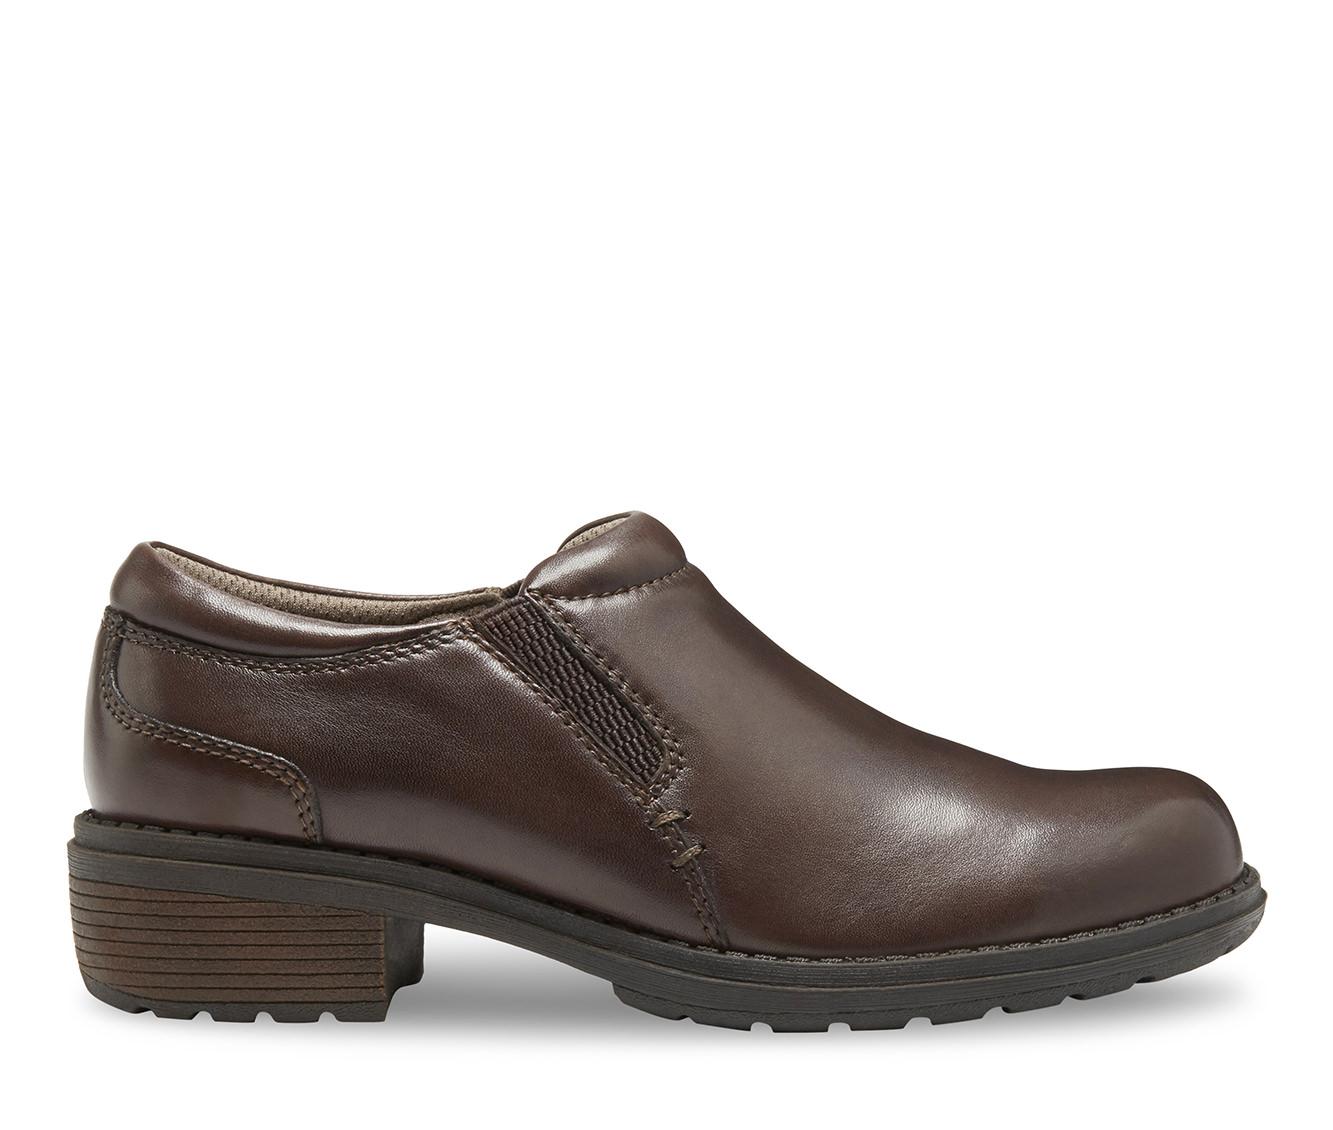 Eastland Double Down Women's Shoe (Brown Leather)